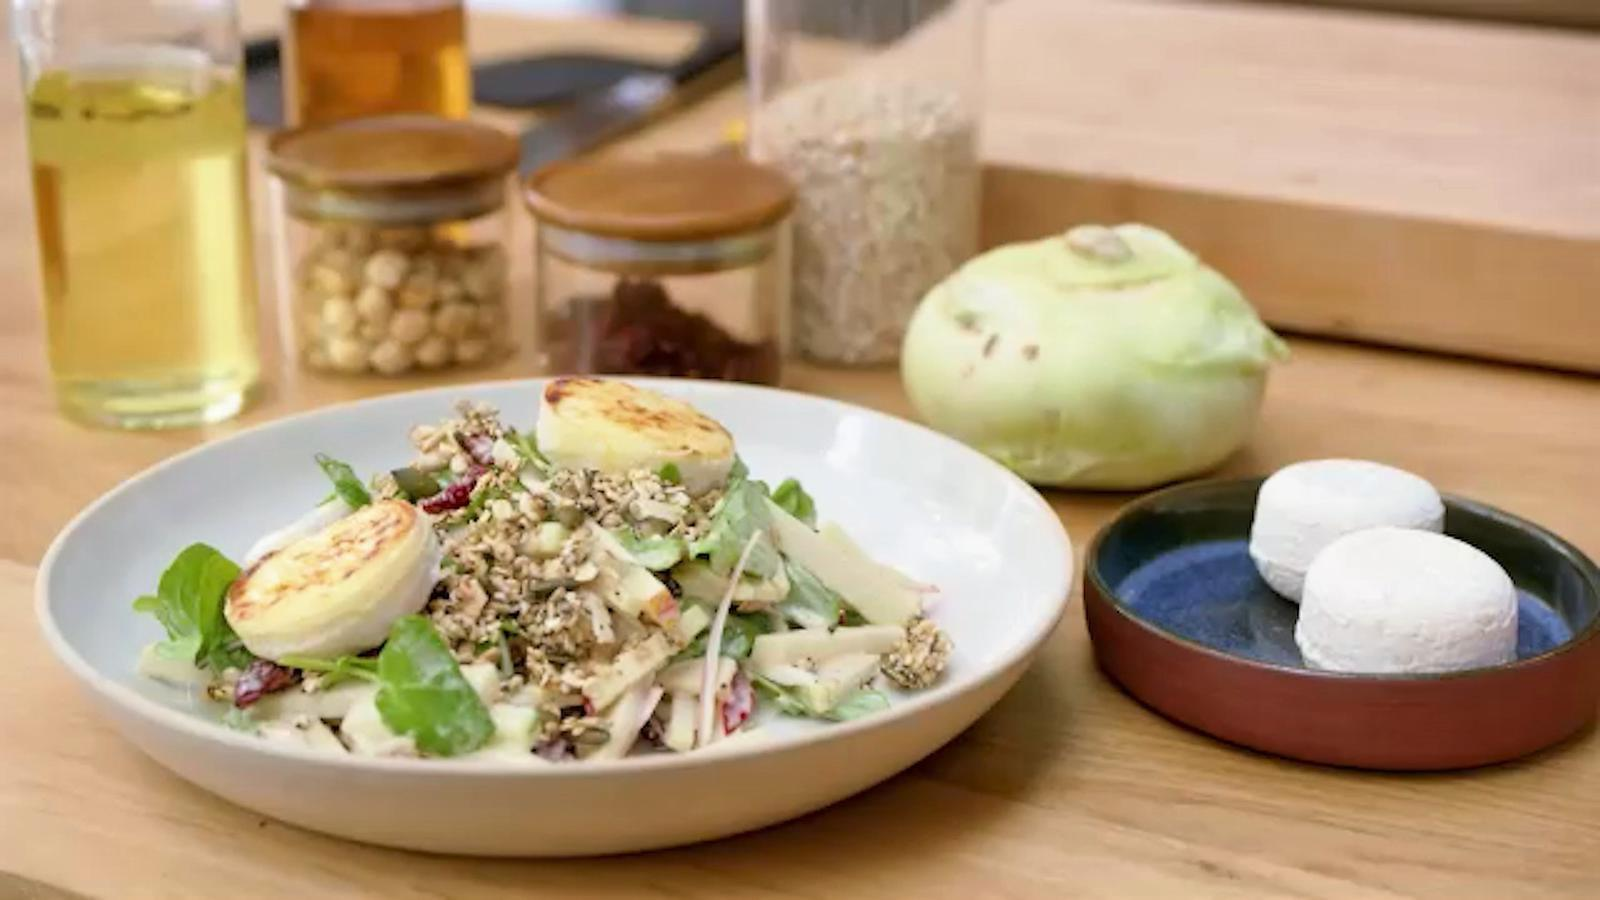 Salade met koolrabi, appel, granola en geitenkaas